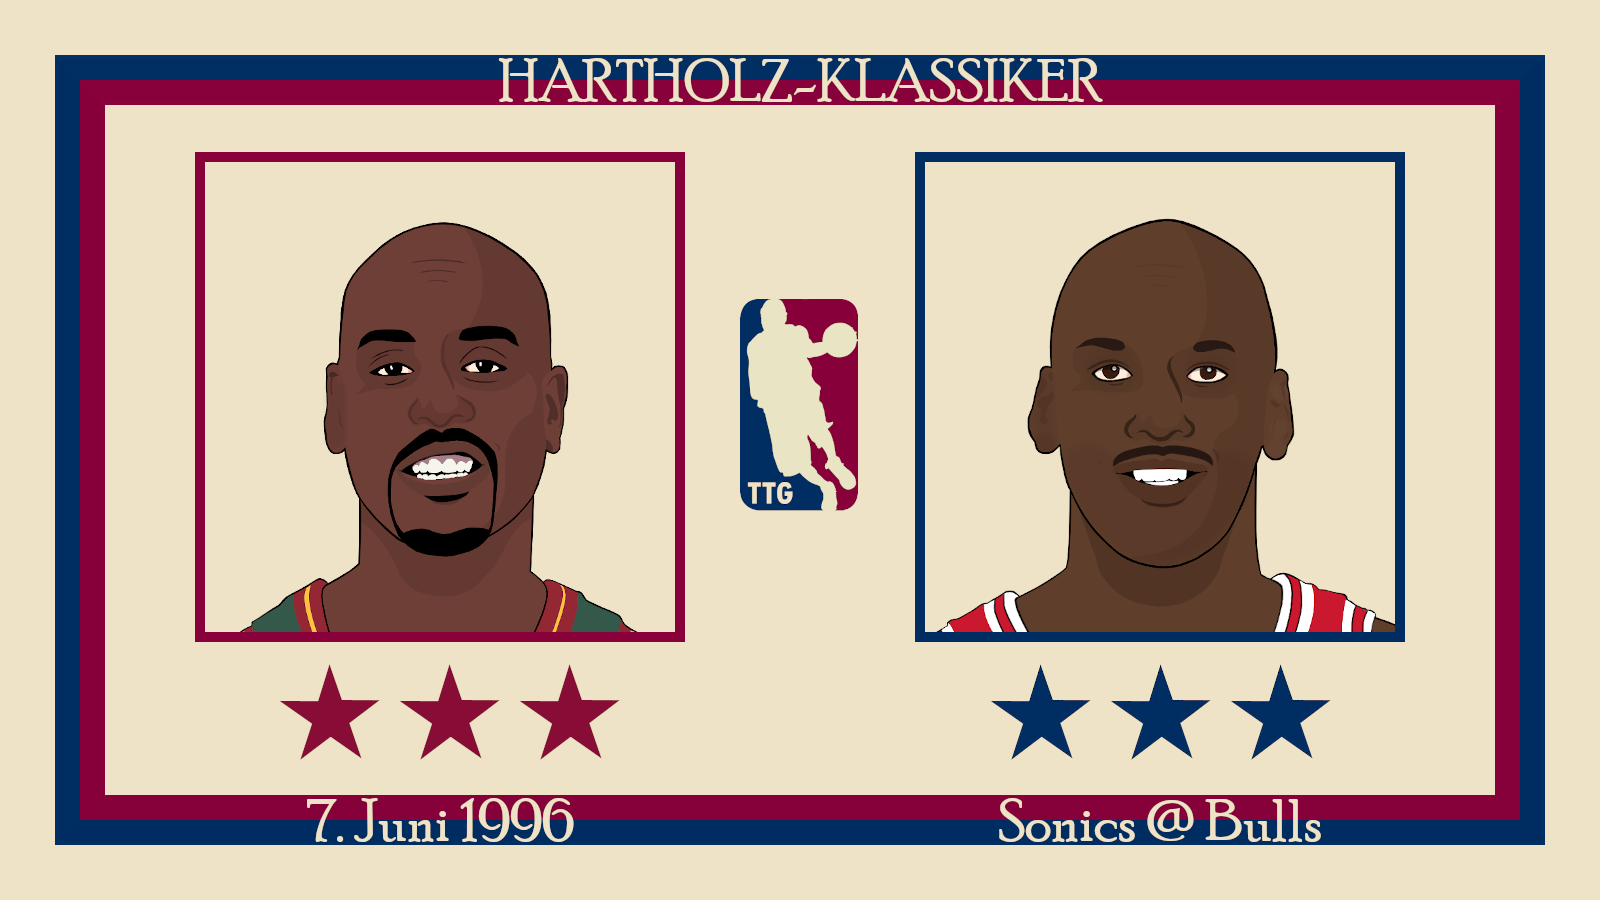 0096_Hartholz-Klassiker - Sonics @ Bulls - SM